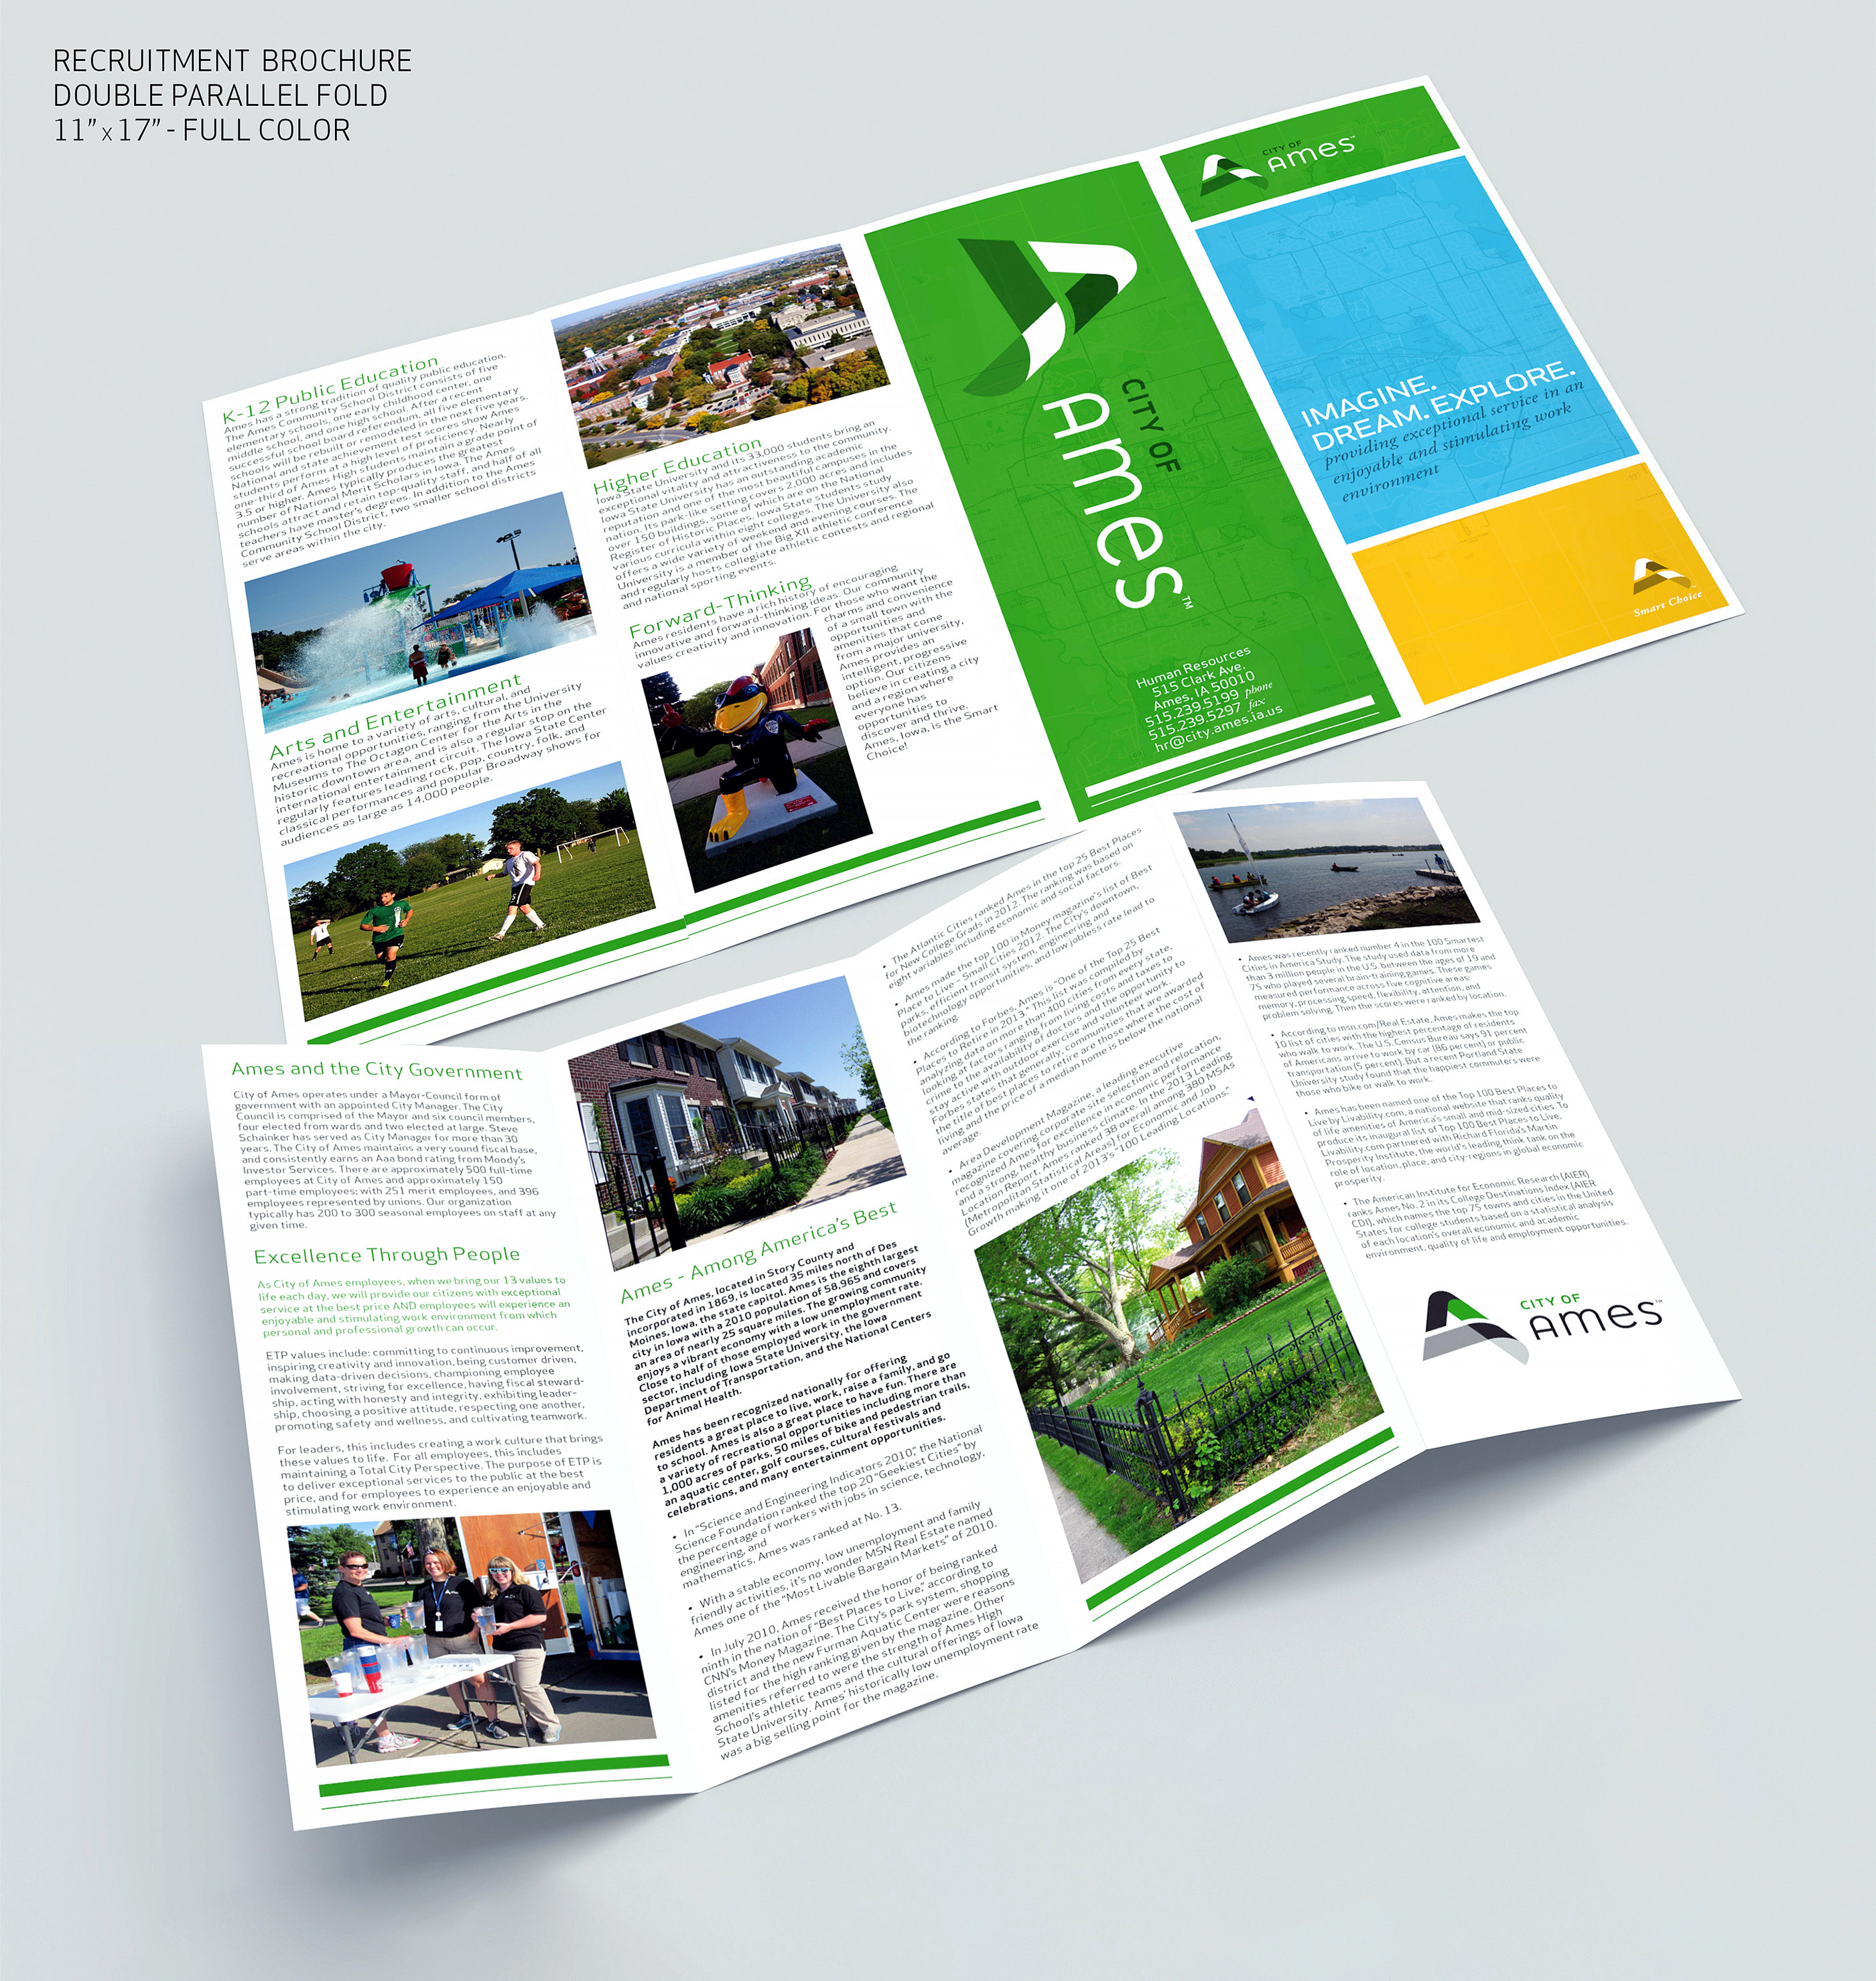 Recruitment Brochure on Behance